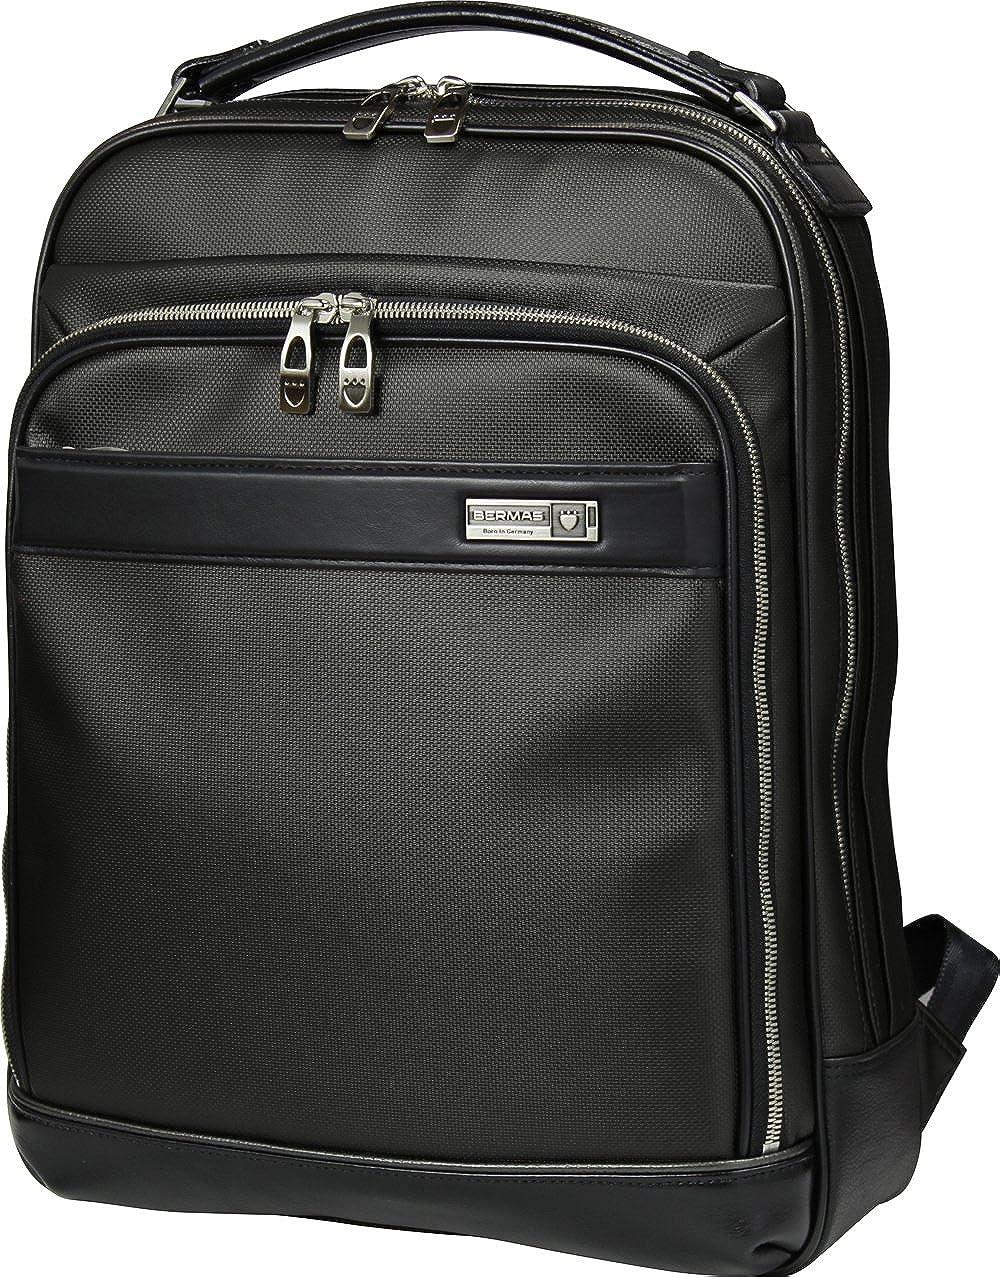 BERMAS バーマス M.I.J MADE IN JAPAN ビジネス 2way ビジネス リュックサック バックパック B4 日本製 豊岡鞄 ブラック 60038-BK B01I38XZMK